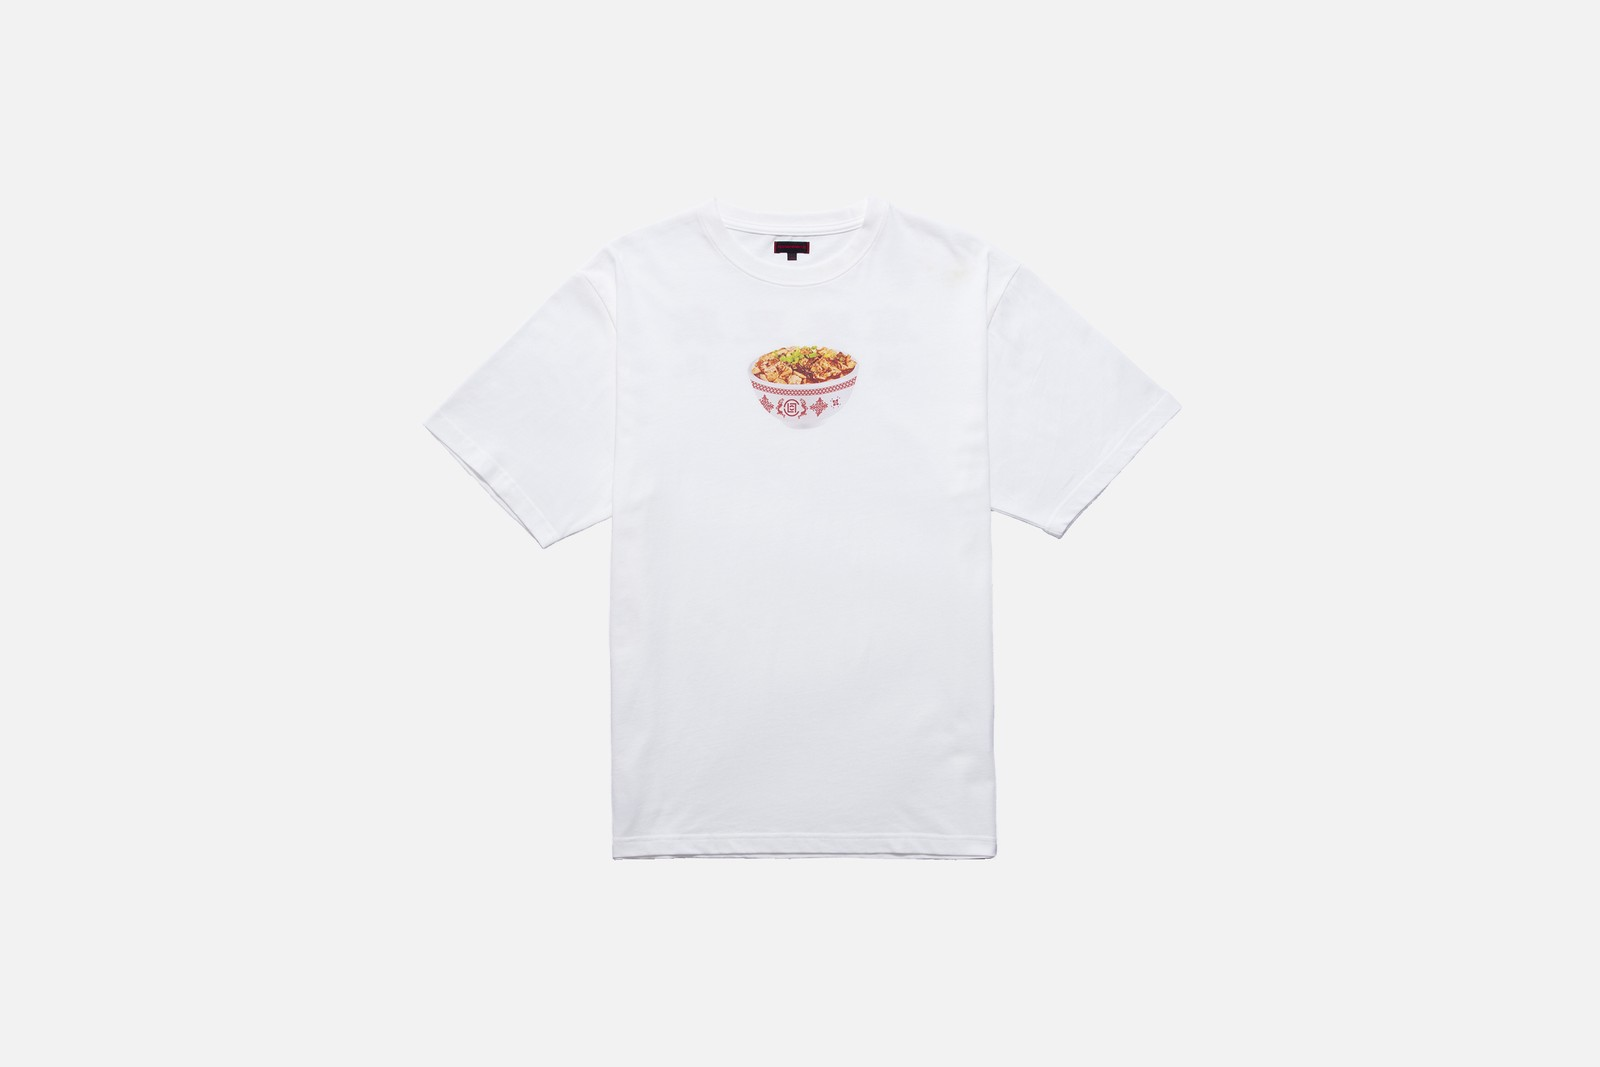 CLOT 将于成都开设「CHINESES Capsule」别注系列 Pop-Up Store